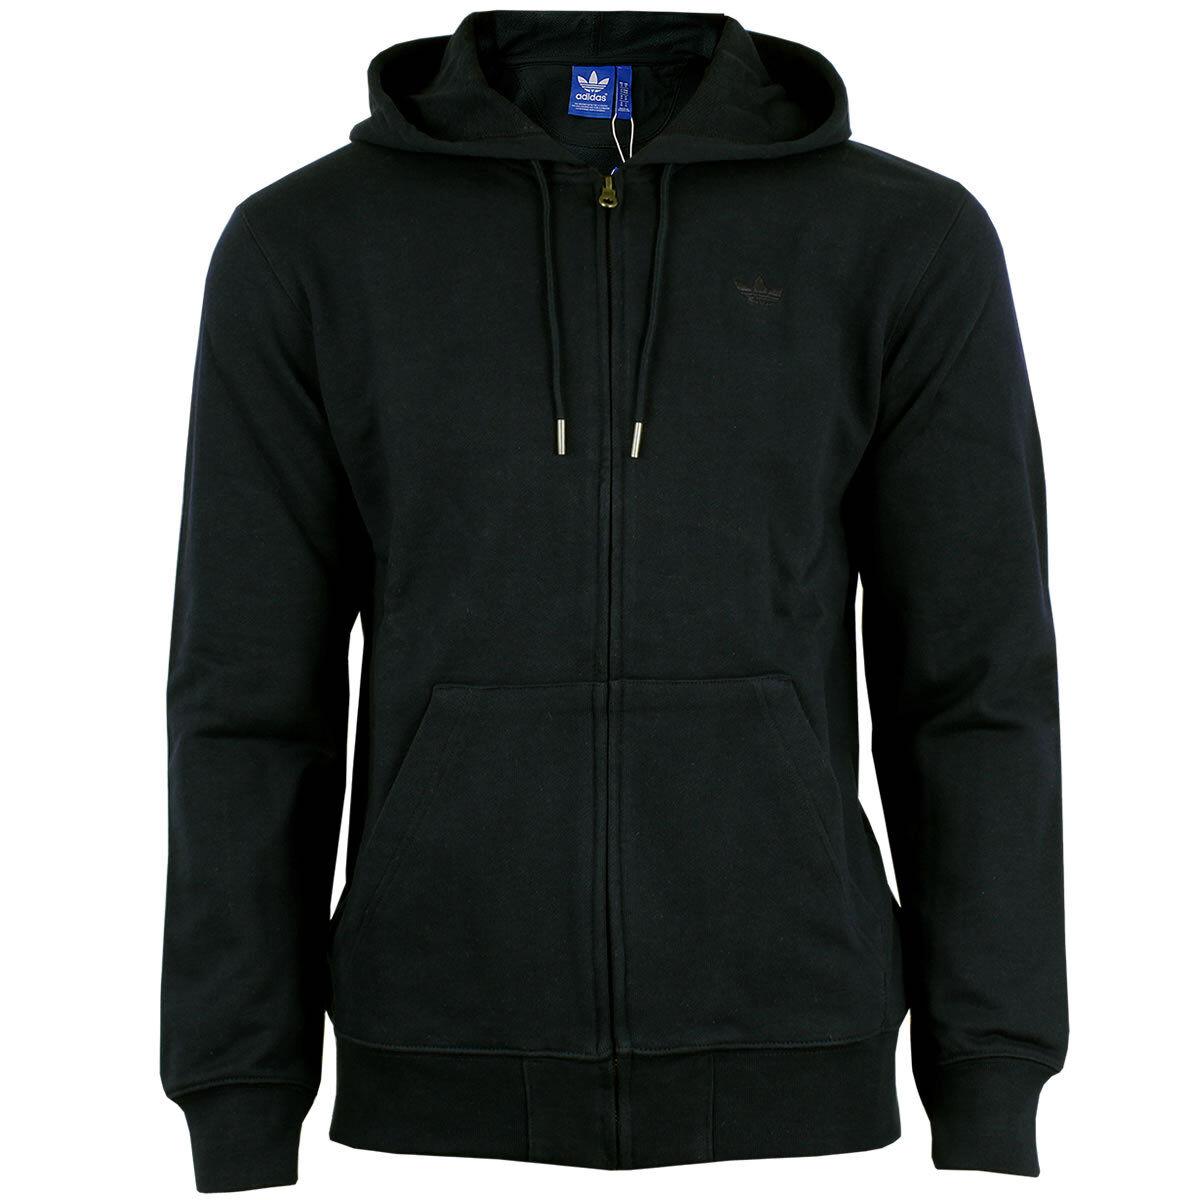 Kapuzenjacke Sweatjacke Jacke Adidas Premium Originals